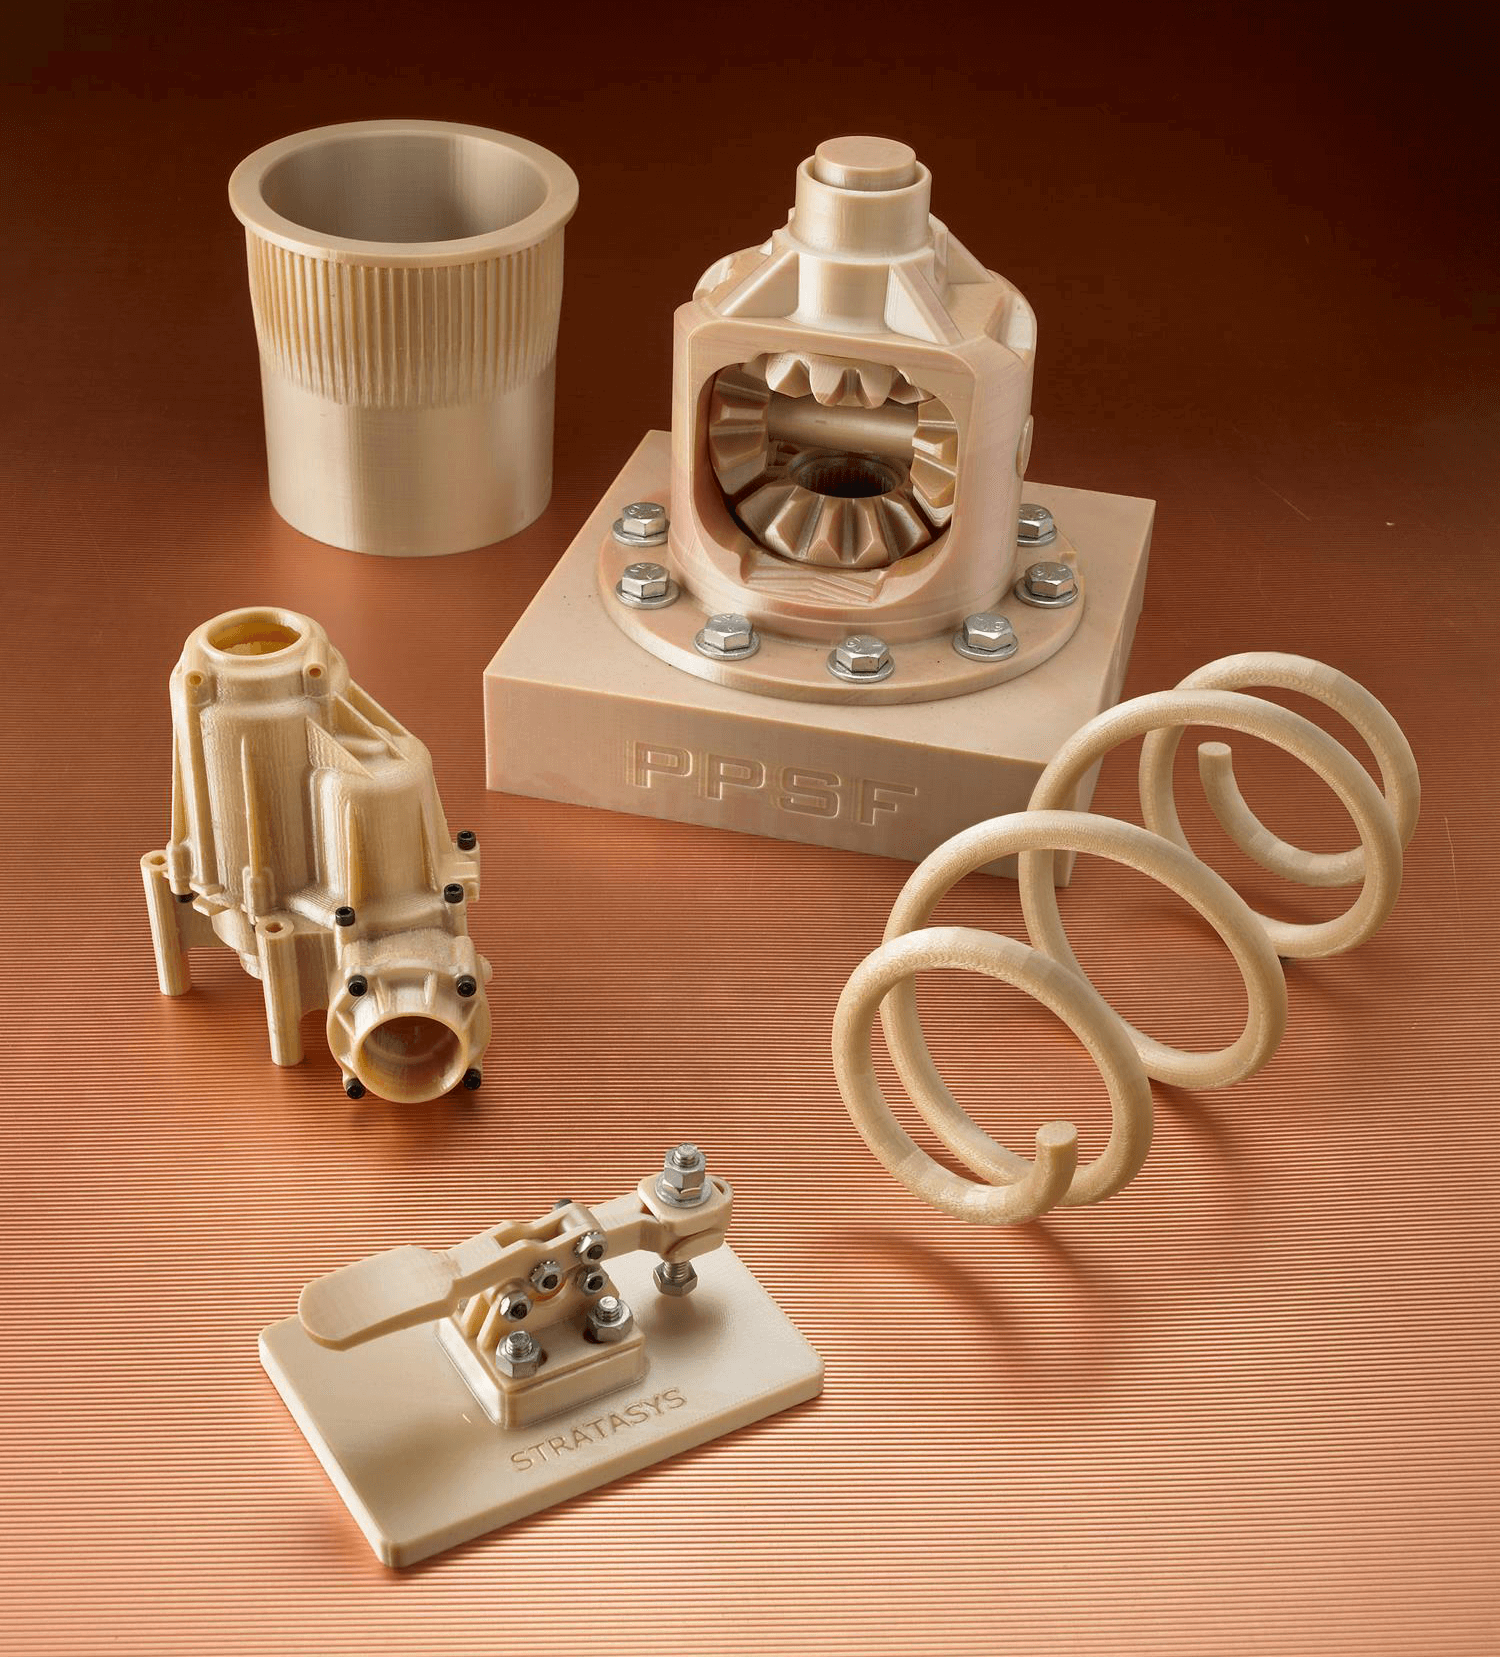 PPSU結合了高強度,耐熱和耐化學性,可用於要求苛刻的功能測試和生產應用。